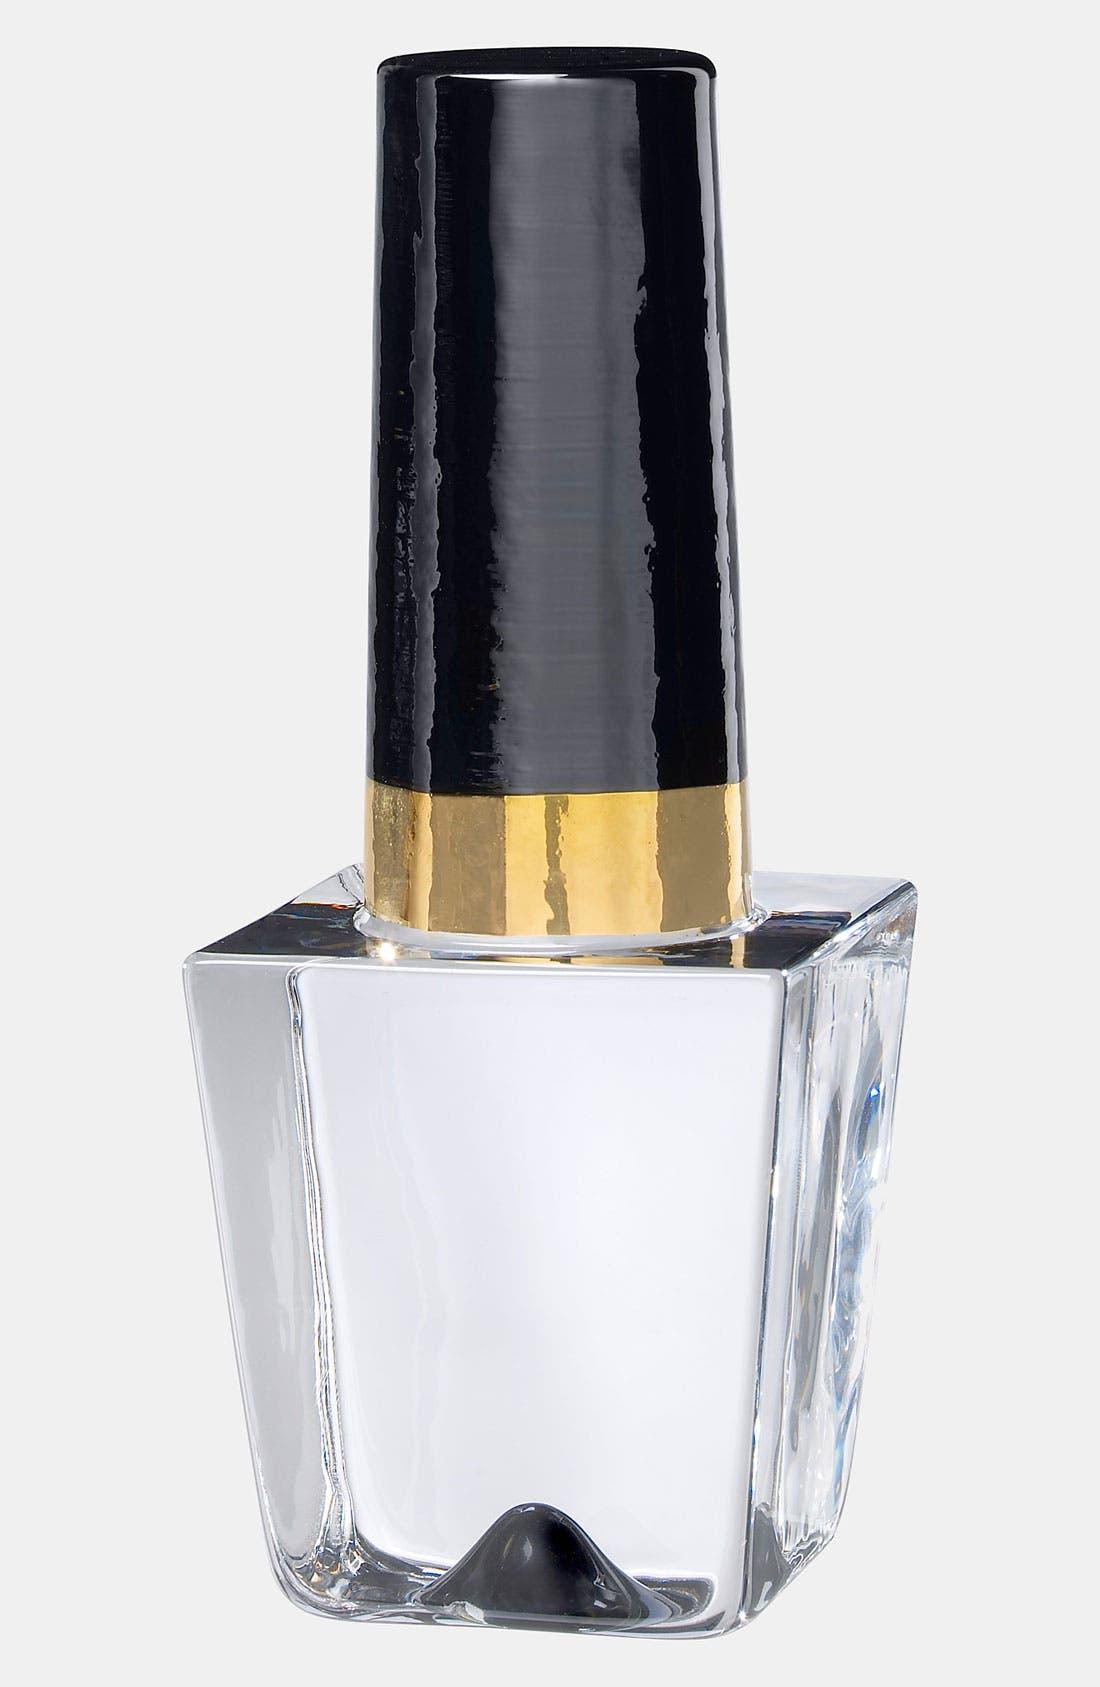 Alternate Image 1 Selected - Kosta Boda 'Makeup Nail Polish Bottle' Sculpture